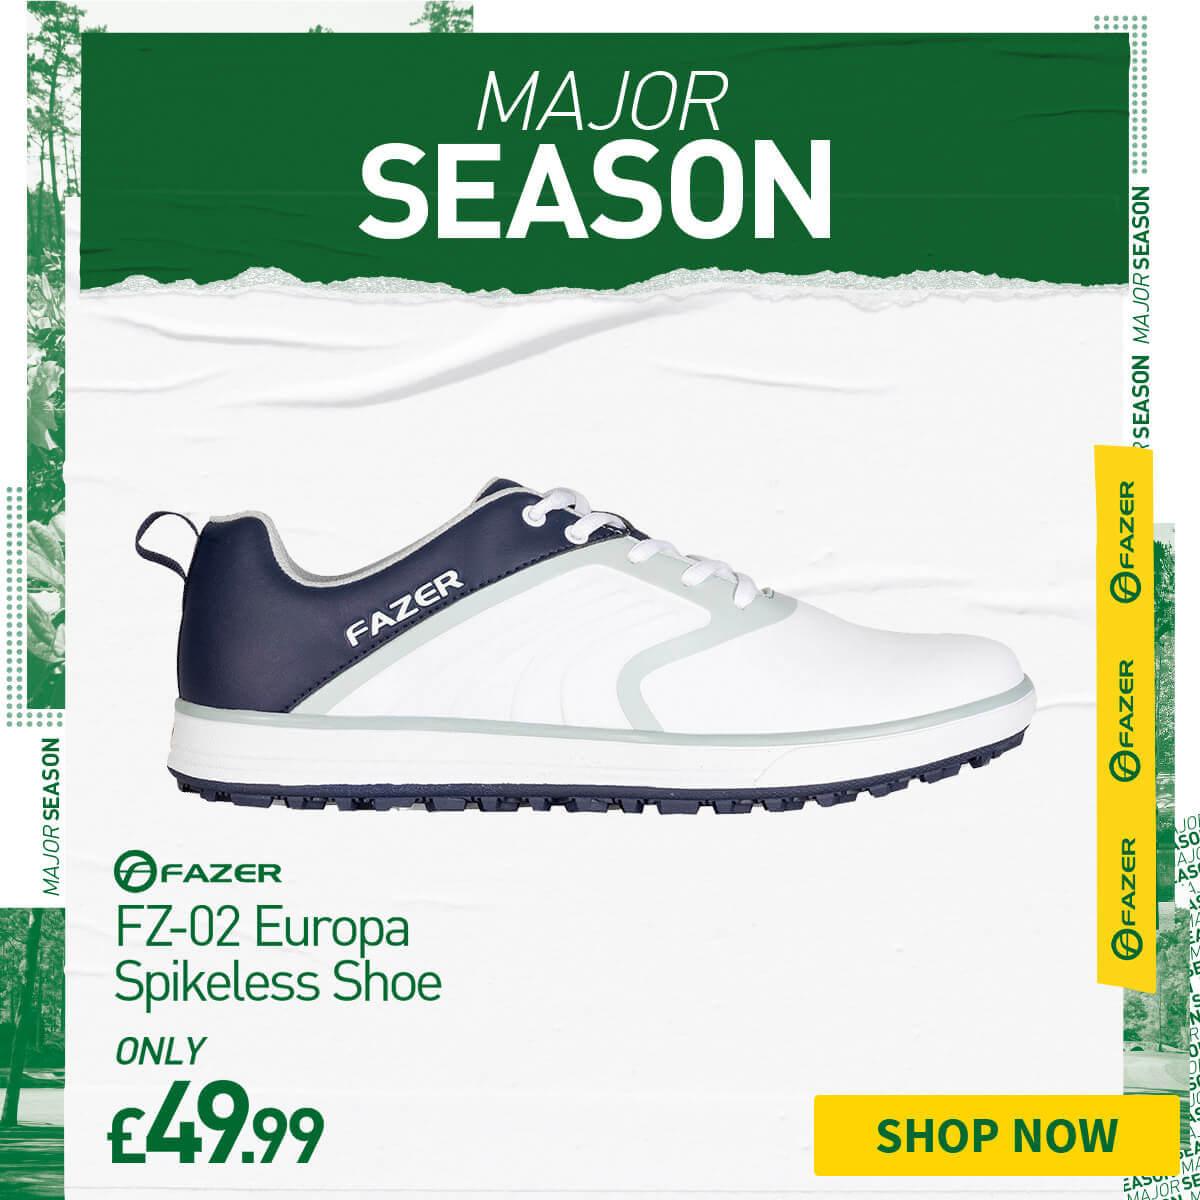 FAZER EUROPA SHOES - ONLY 49.99